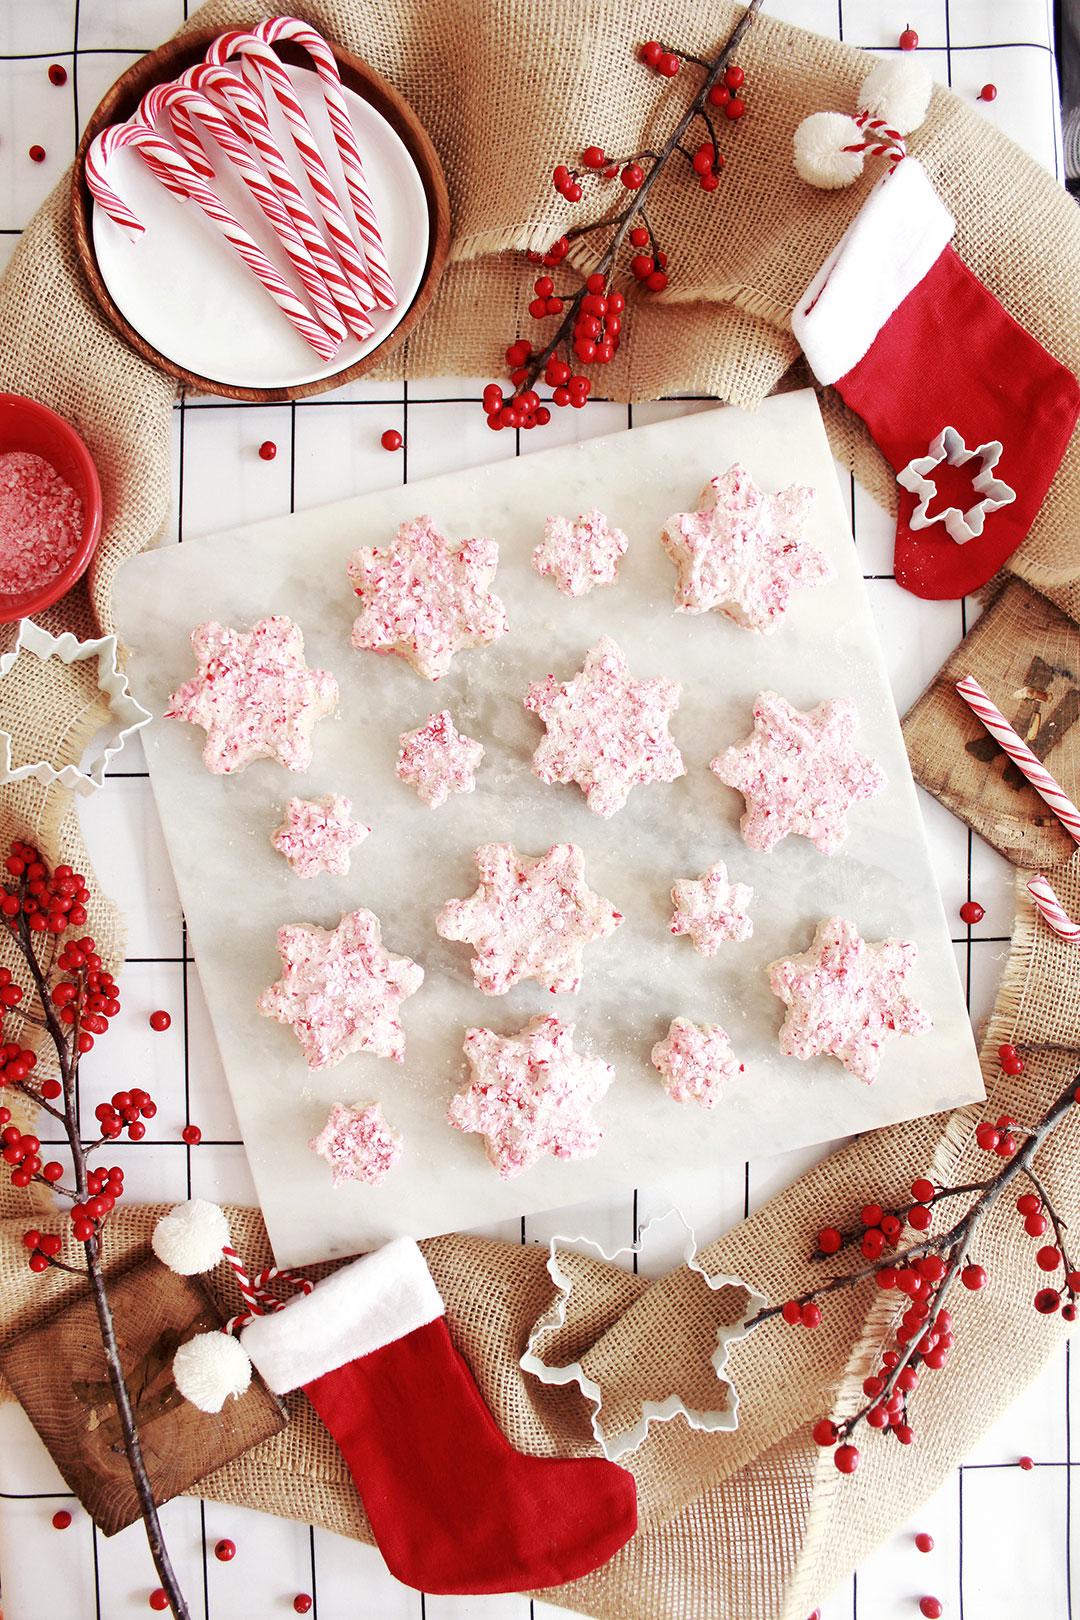 Homemade Snowflake Peppermint Marshmallows Recipe